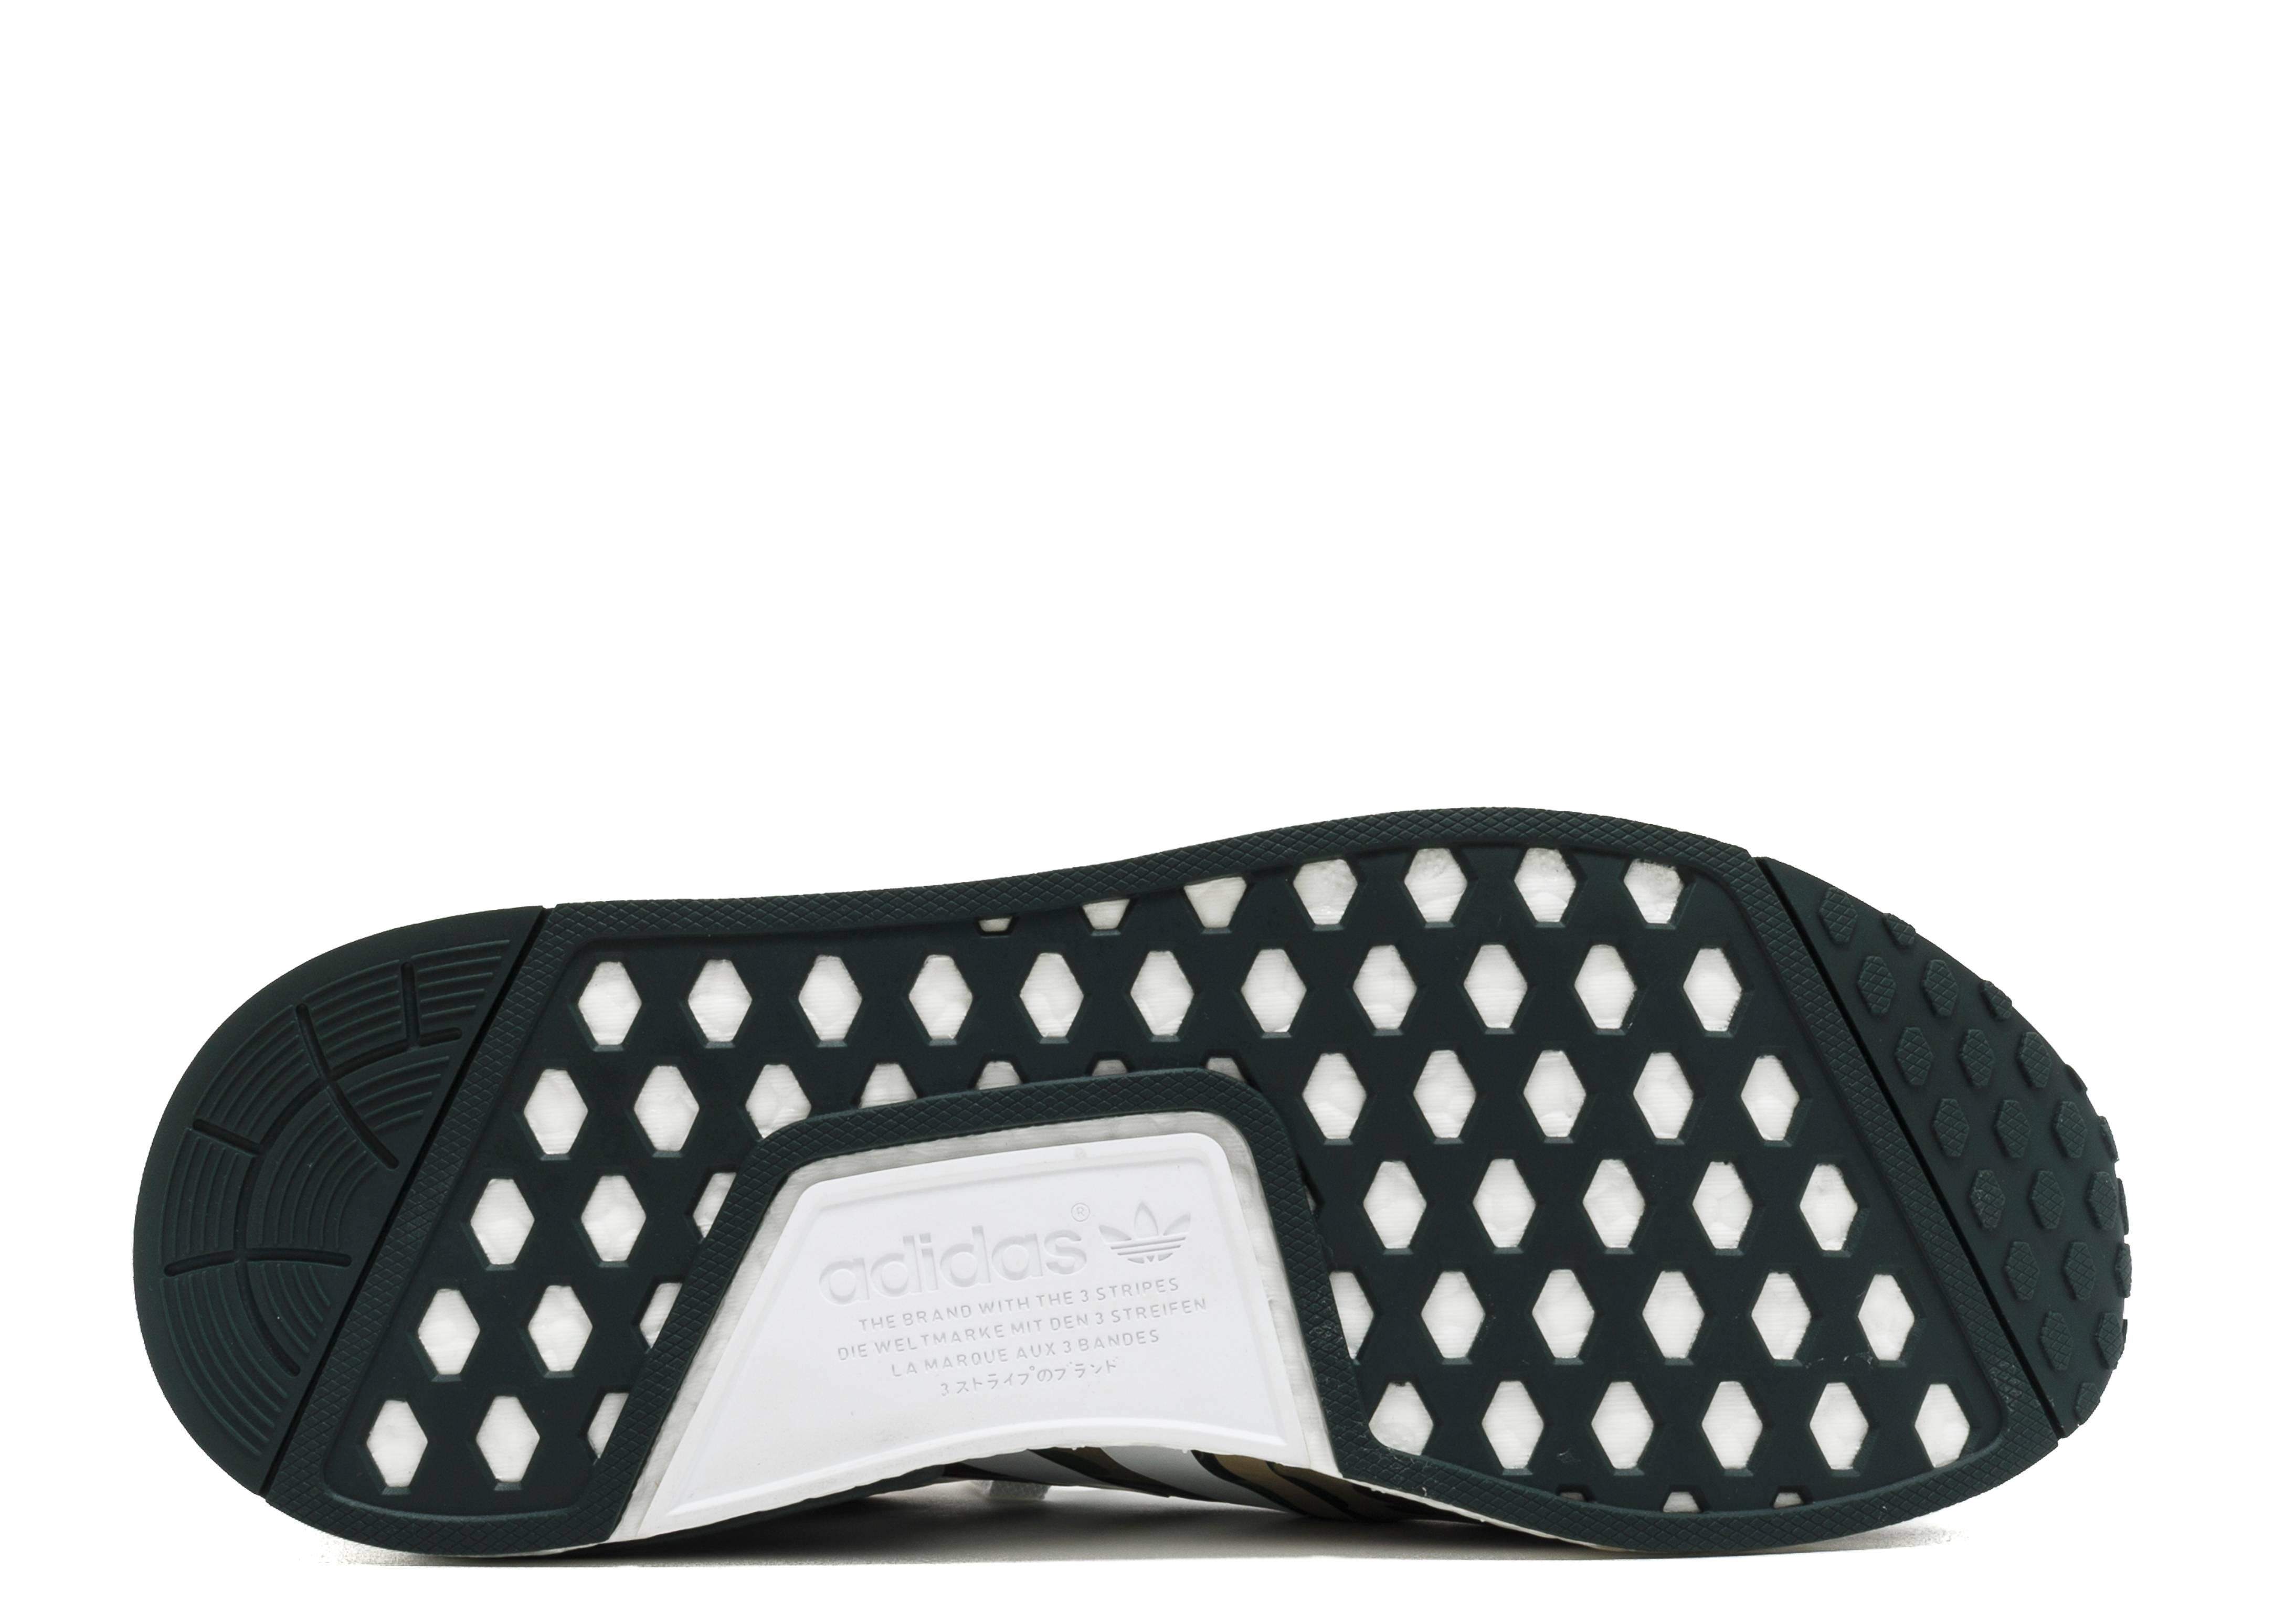 adidas Originals NMD R1 PK Primeknit Boost STLT Stealth Pack (oliv grün weiss) (EU 43 13 US 9.5)